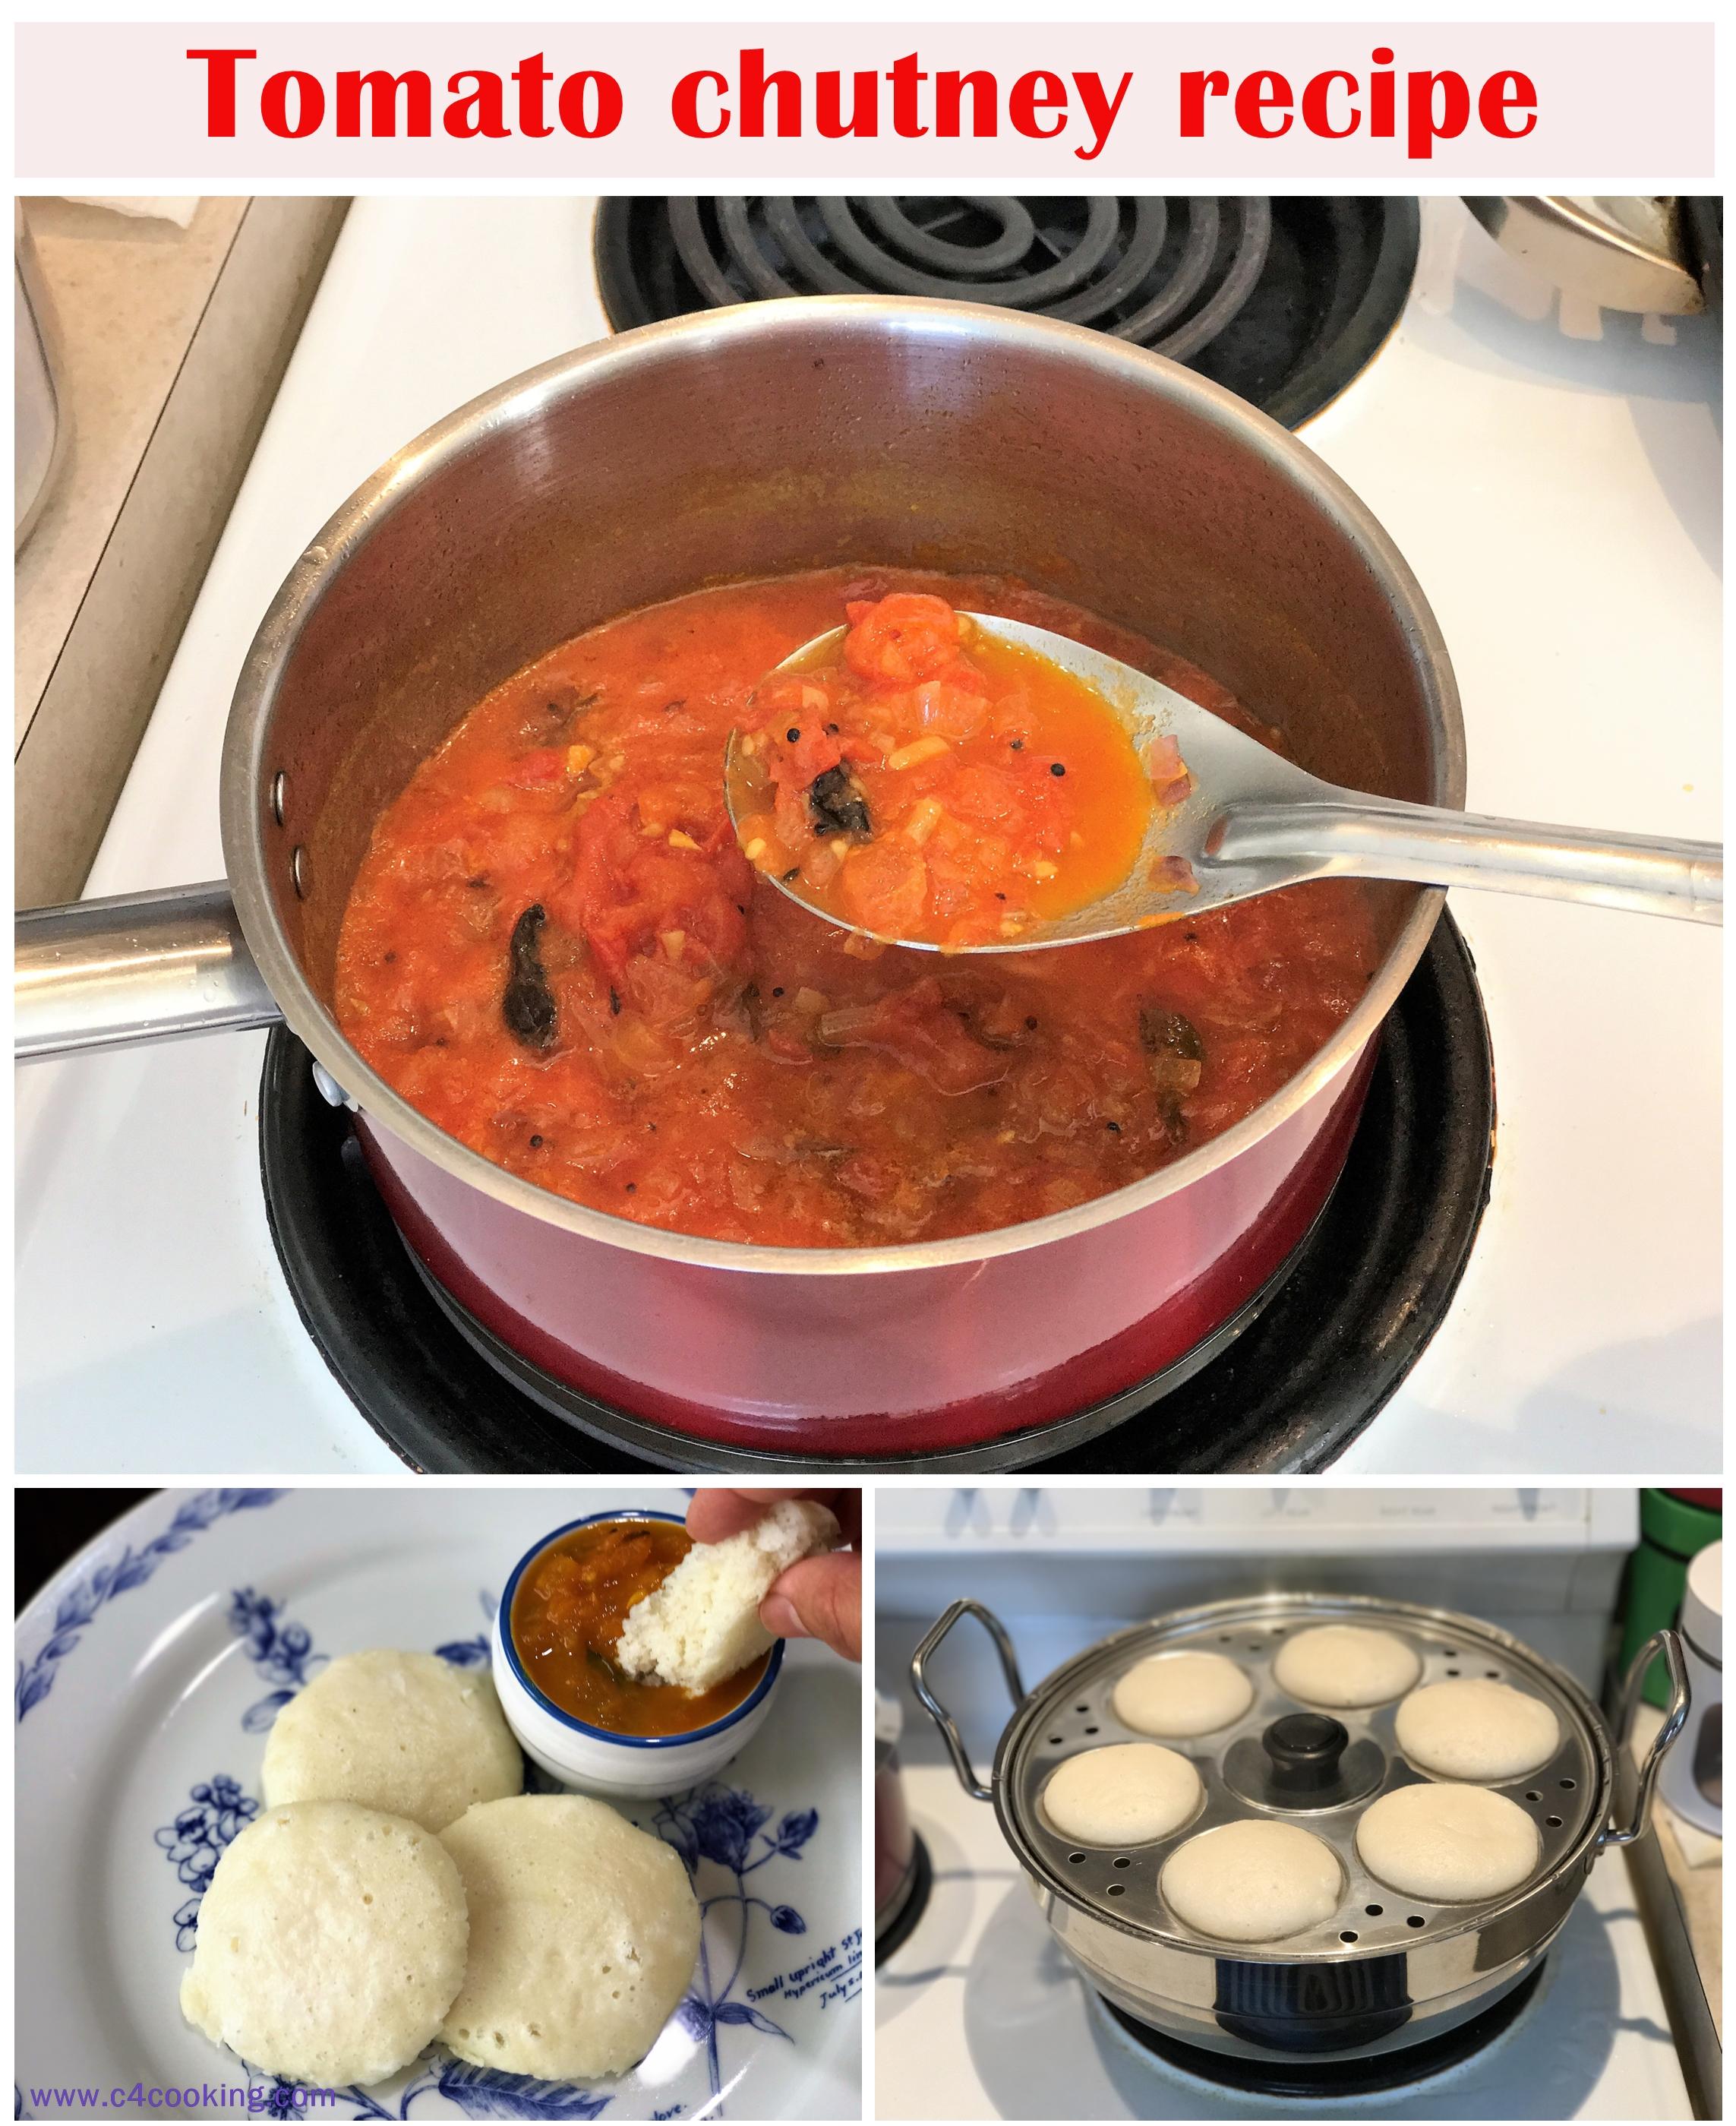 tomato chutney recipe, tomato chutney for kids babies toddler, idli and tomato chutney recipe, c4cooking tomato chutney recipe